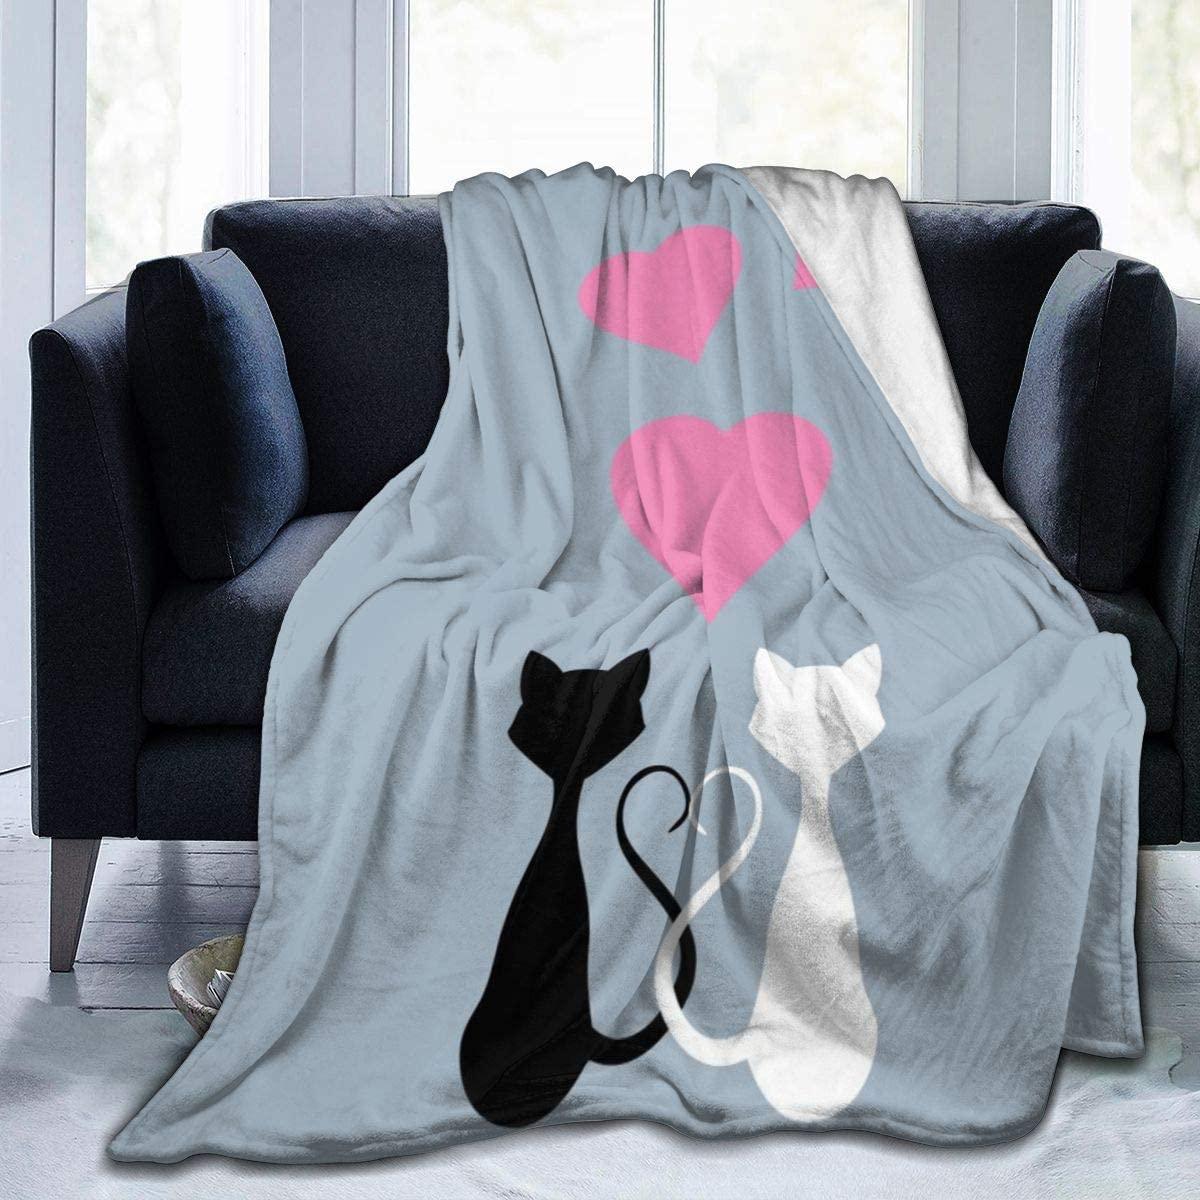 Micro Fleece Plush Soft Baby Blanket Cute Cartoon Cats Love Pink Hearts Fluffy Warm Toddler Bed/Crib Blanket Lightweight Flannel Daycare Nap Kids Sleeping Tummy Time Throw Blanket Girls Boy Kid/Baby